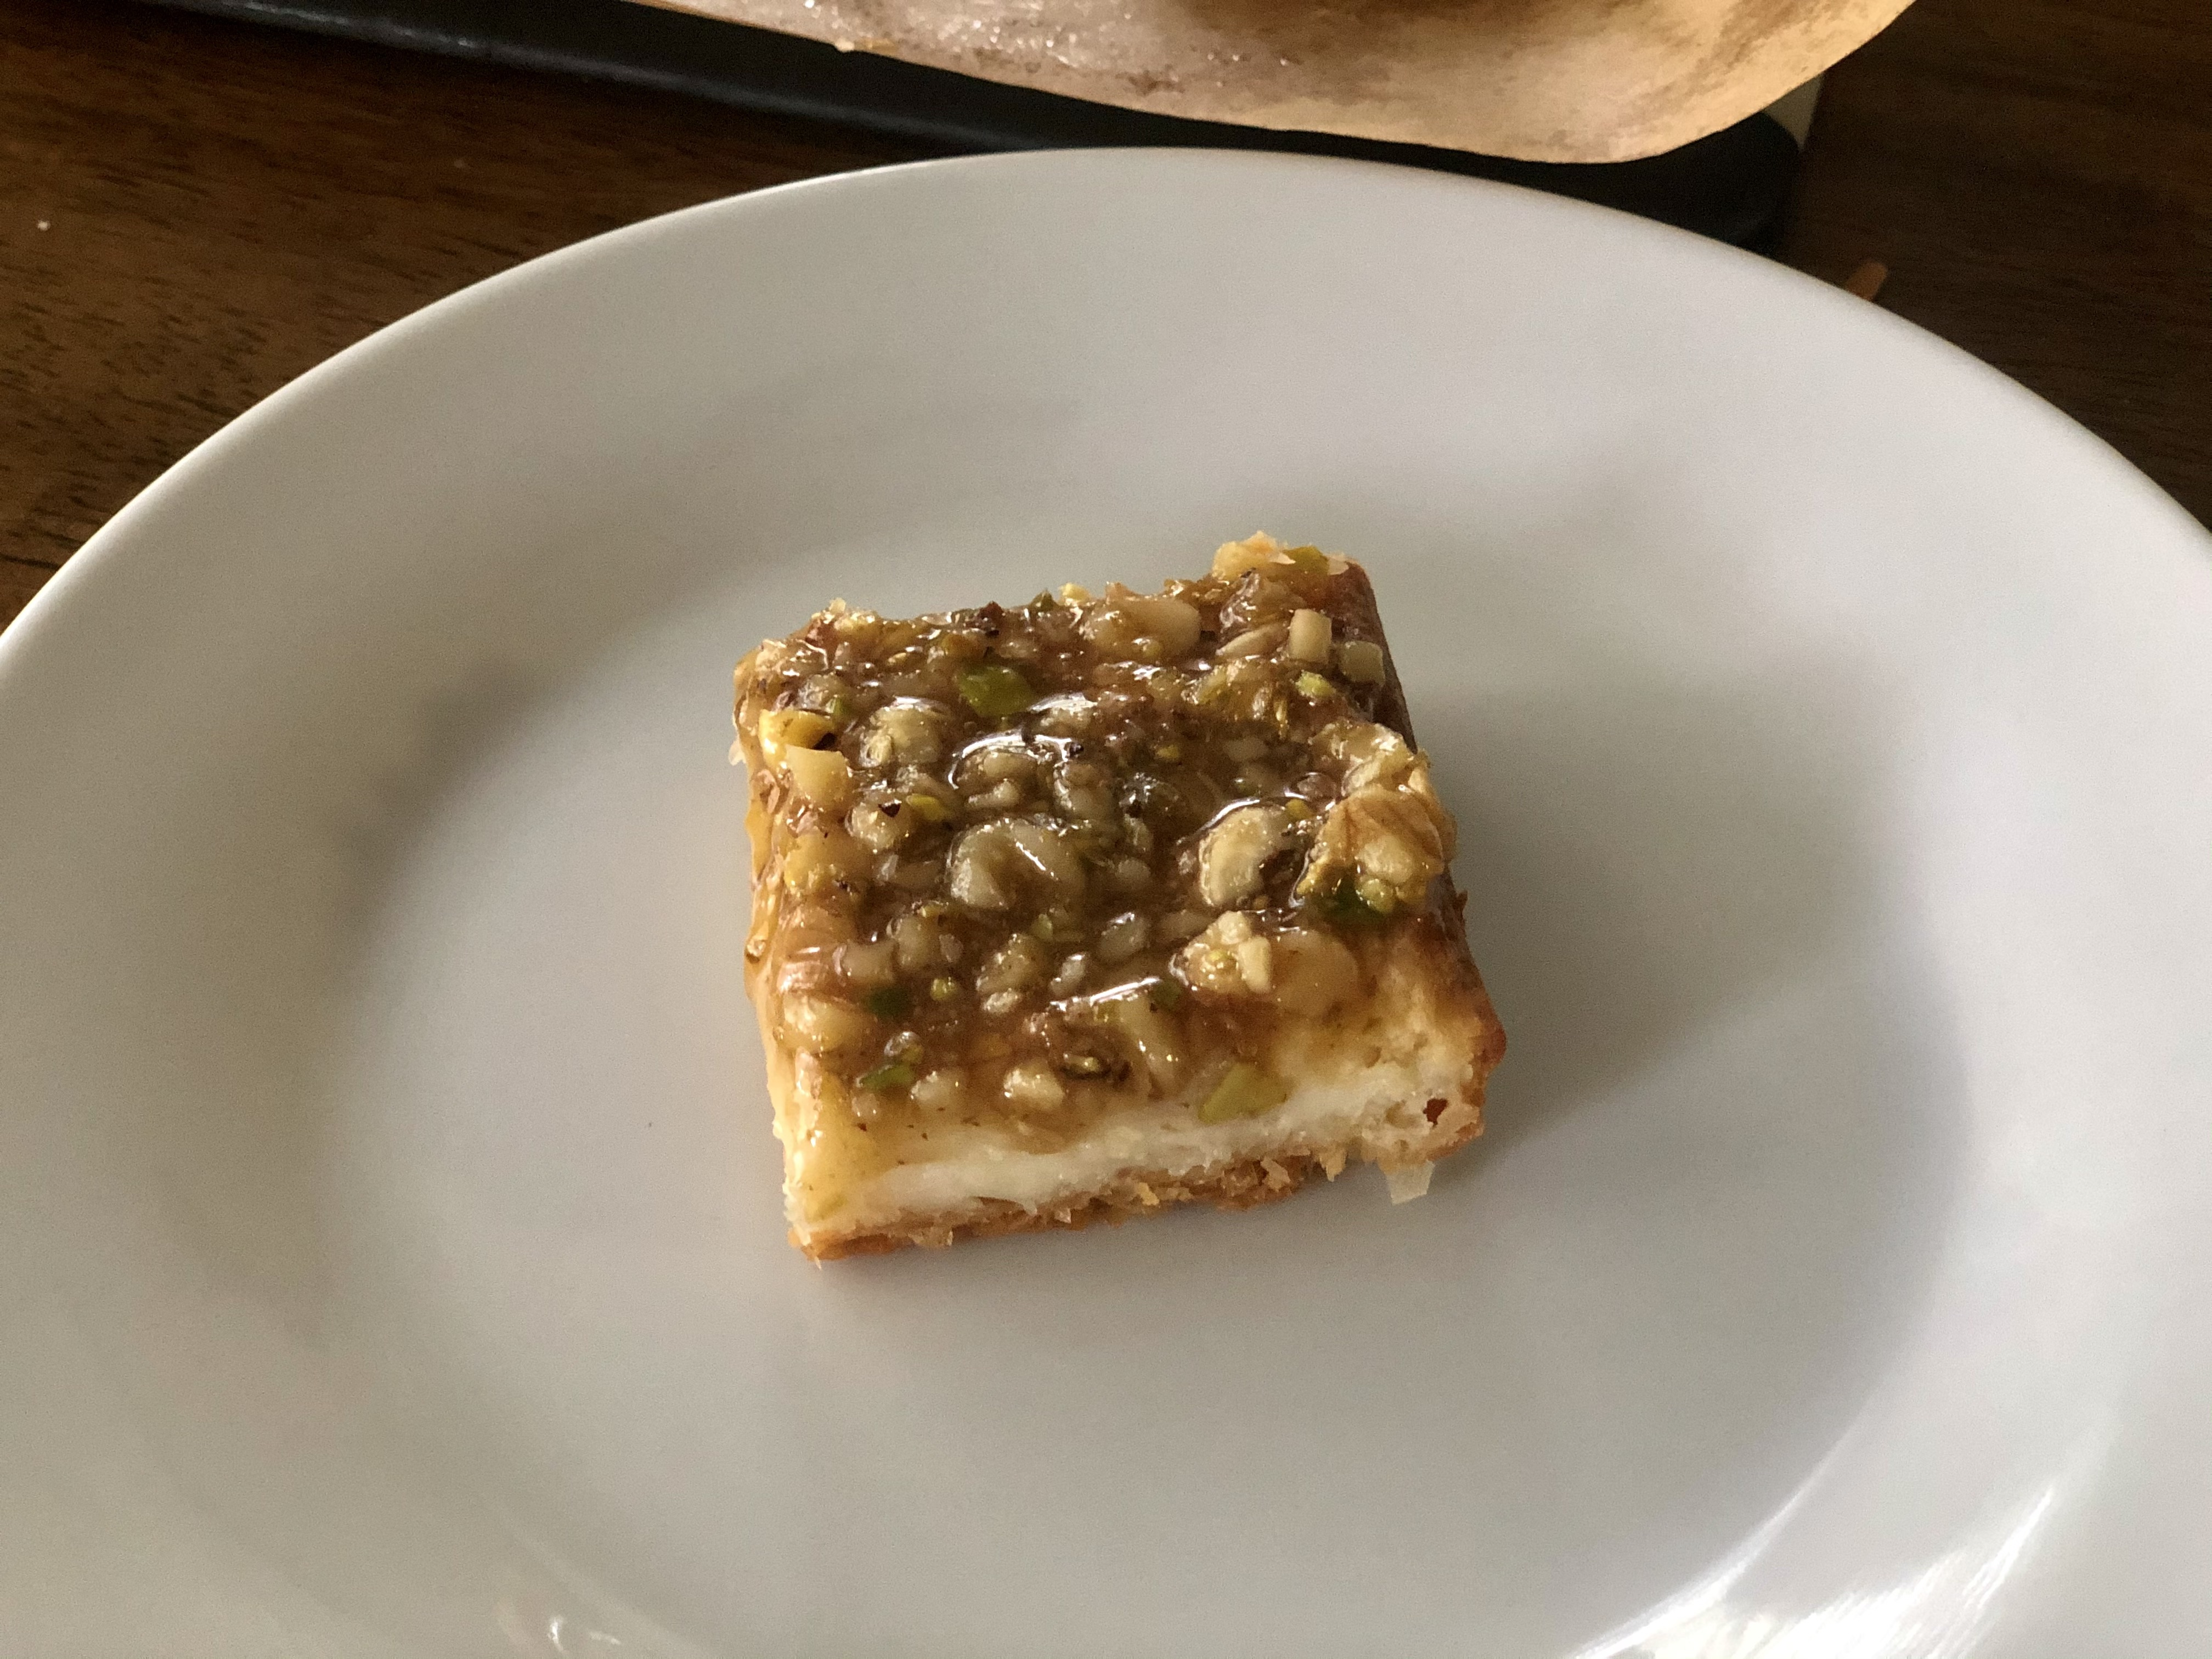 Baklava-Style Cheesecake Bars